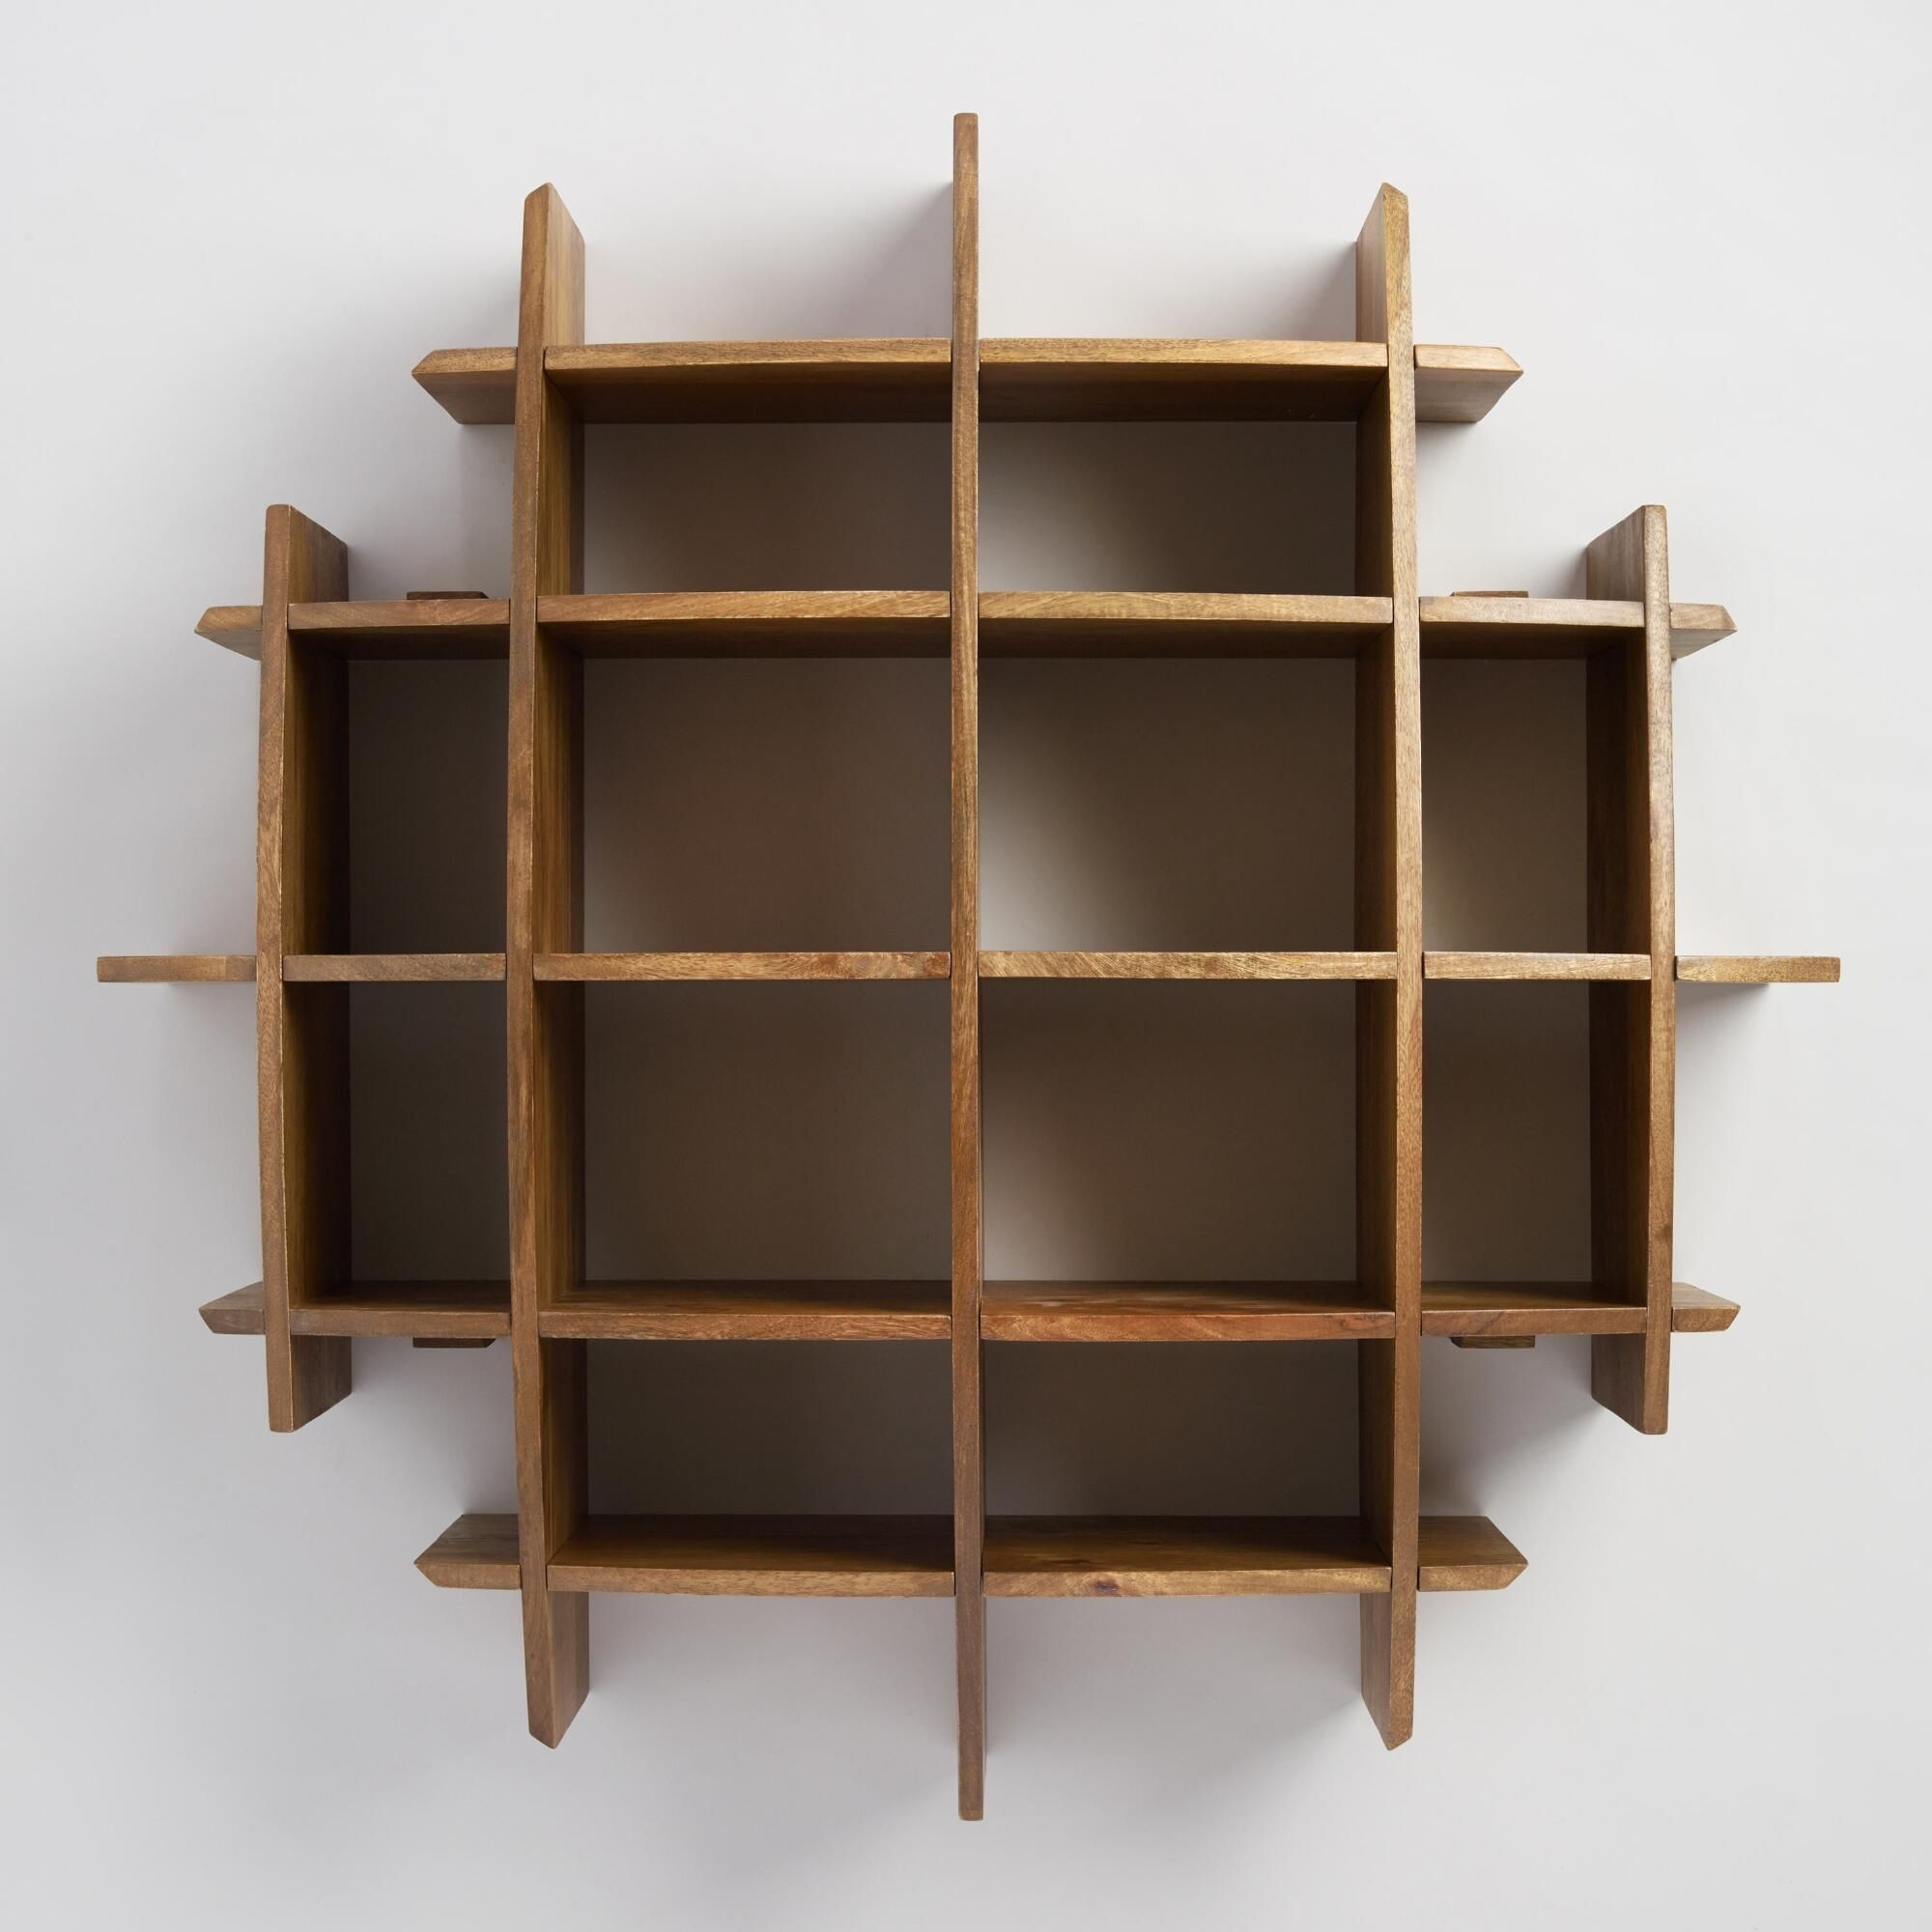 Unique Wood Walls Design Ideas For Your Home33